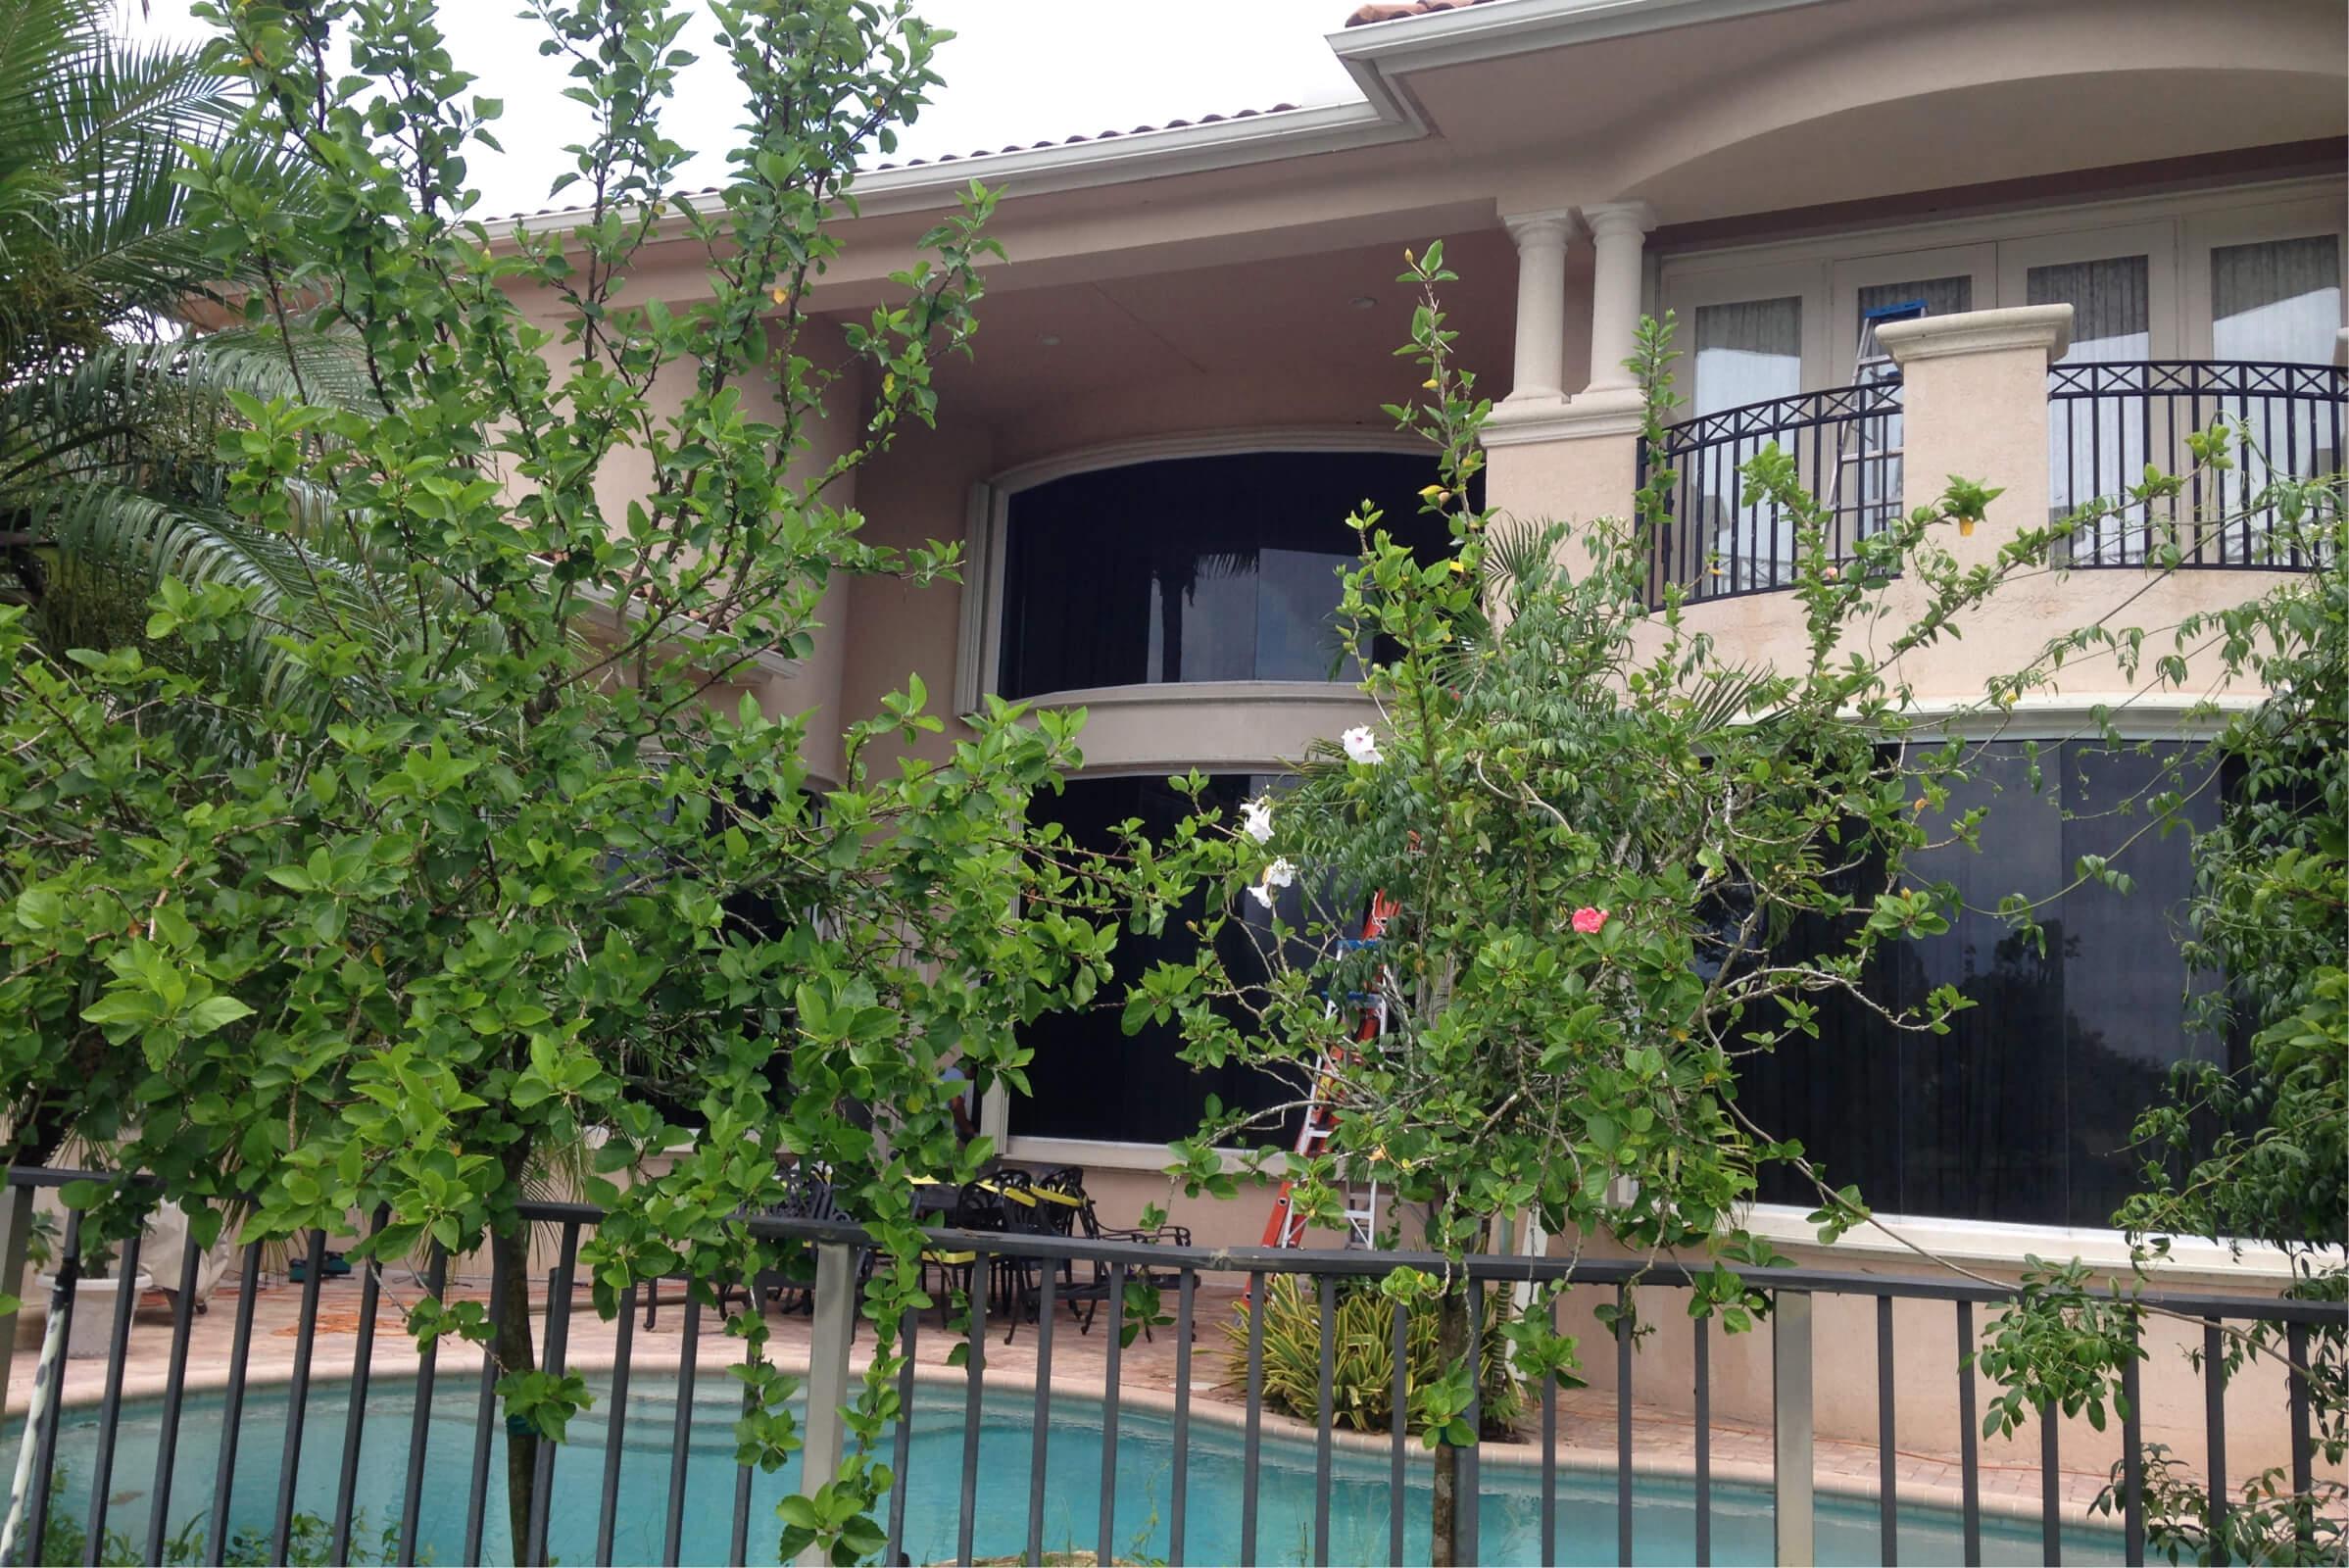 Accordion hurricane shutters on a south florida home